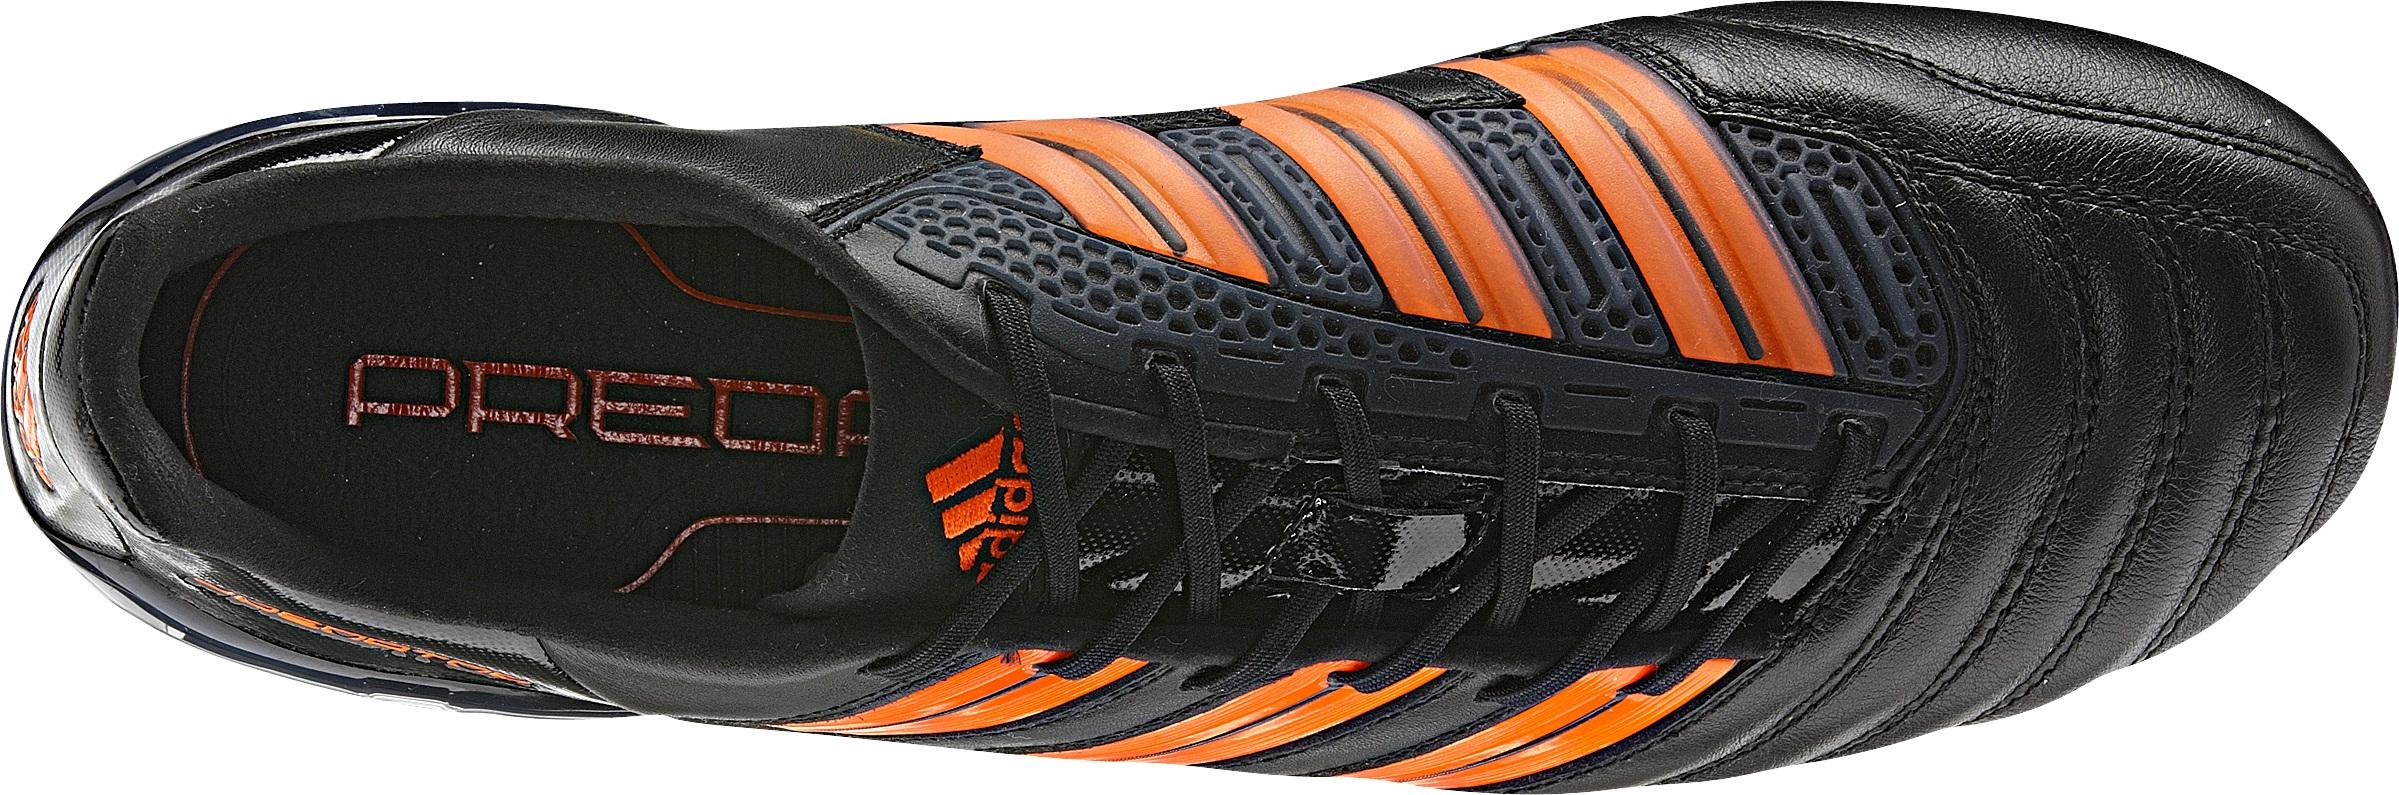 Football boot release  adidas adiPower Predator   Black Warning ... 95a594a0c